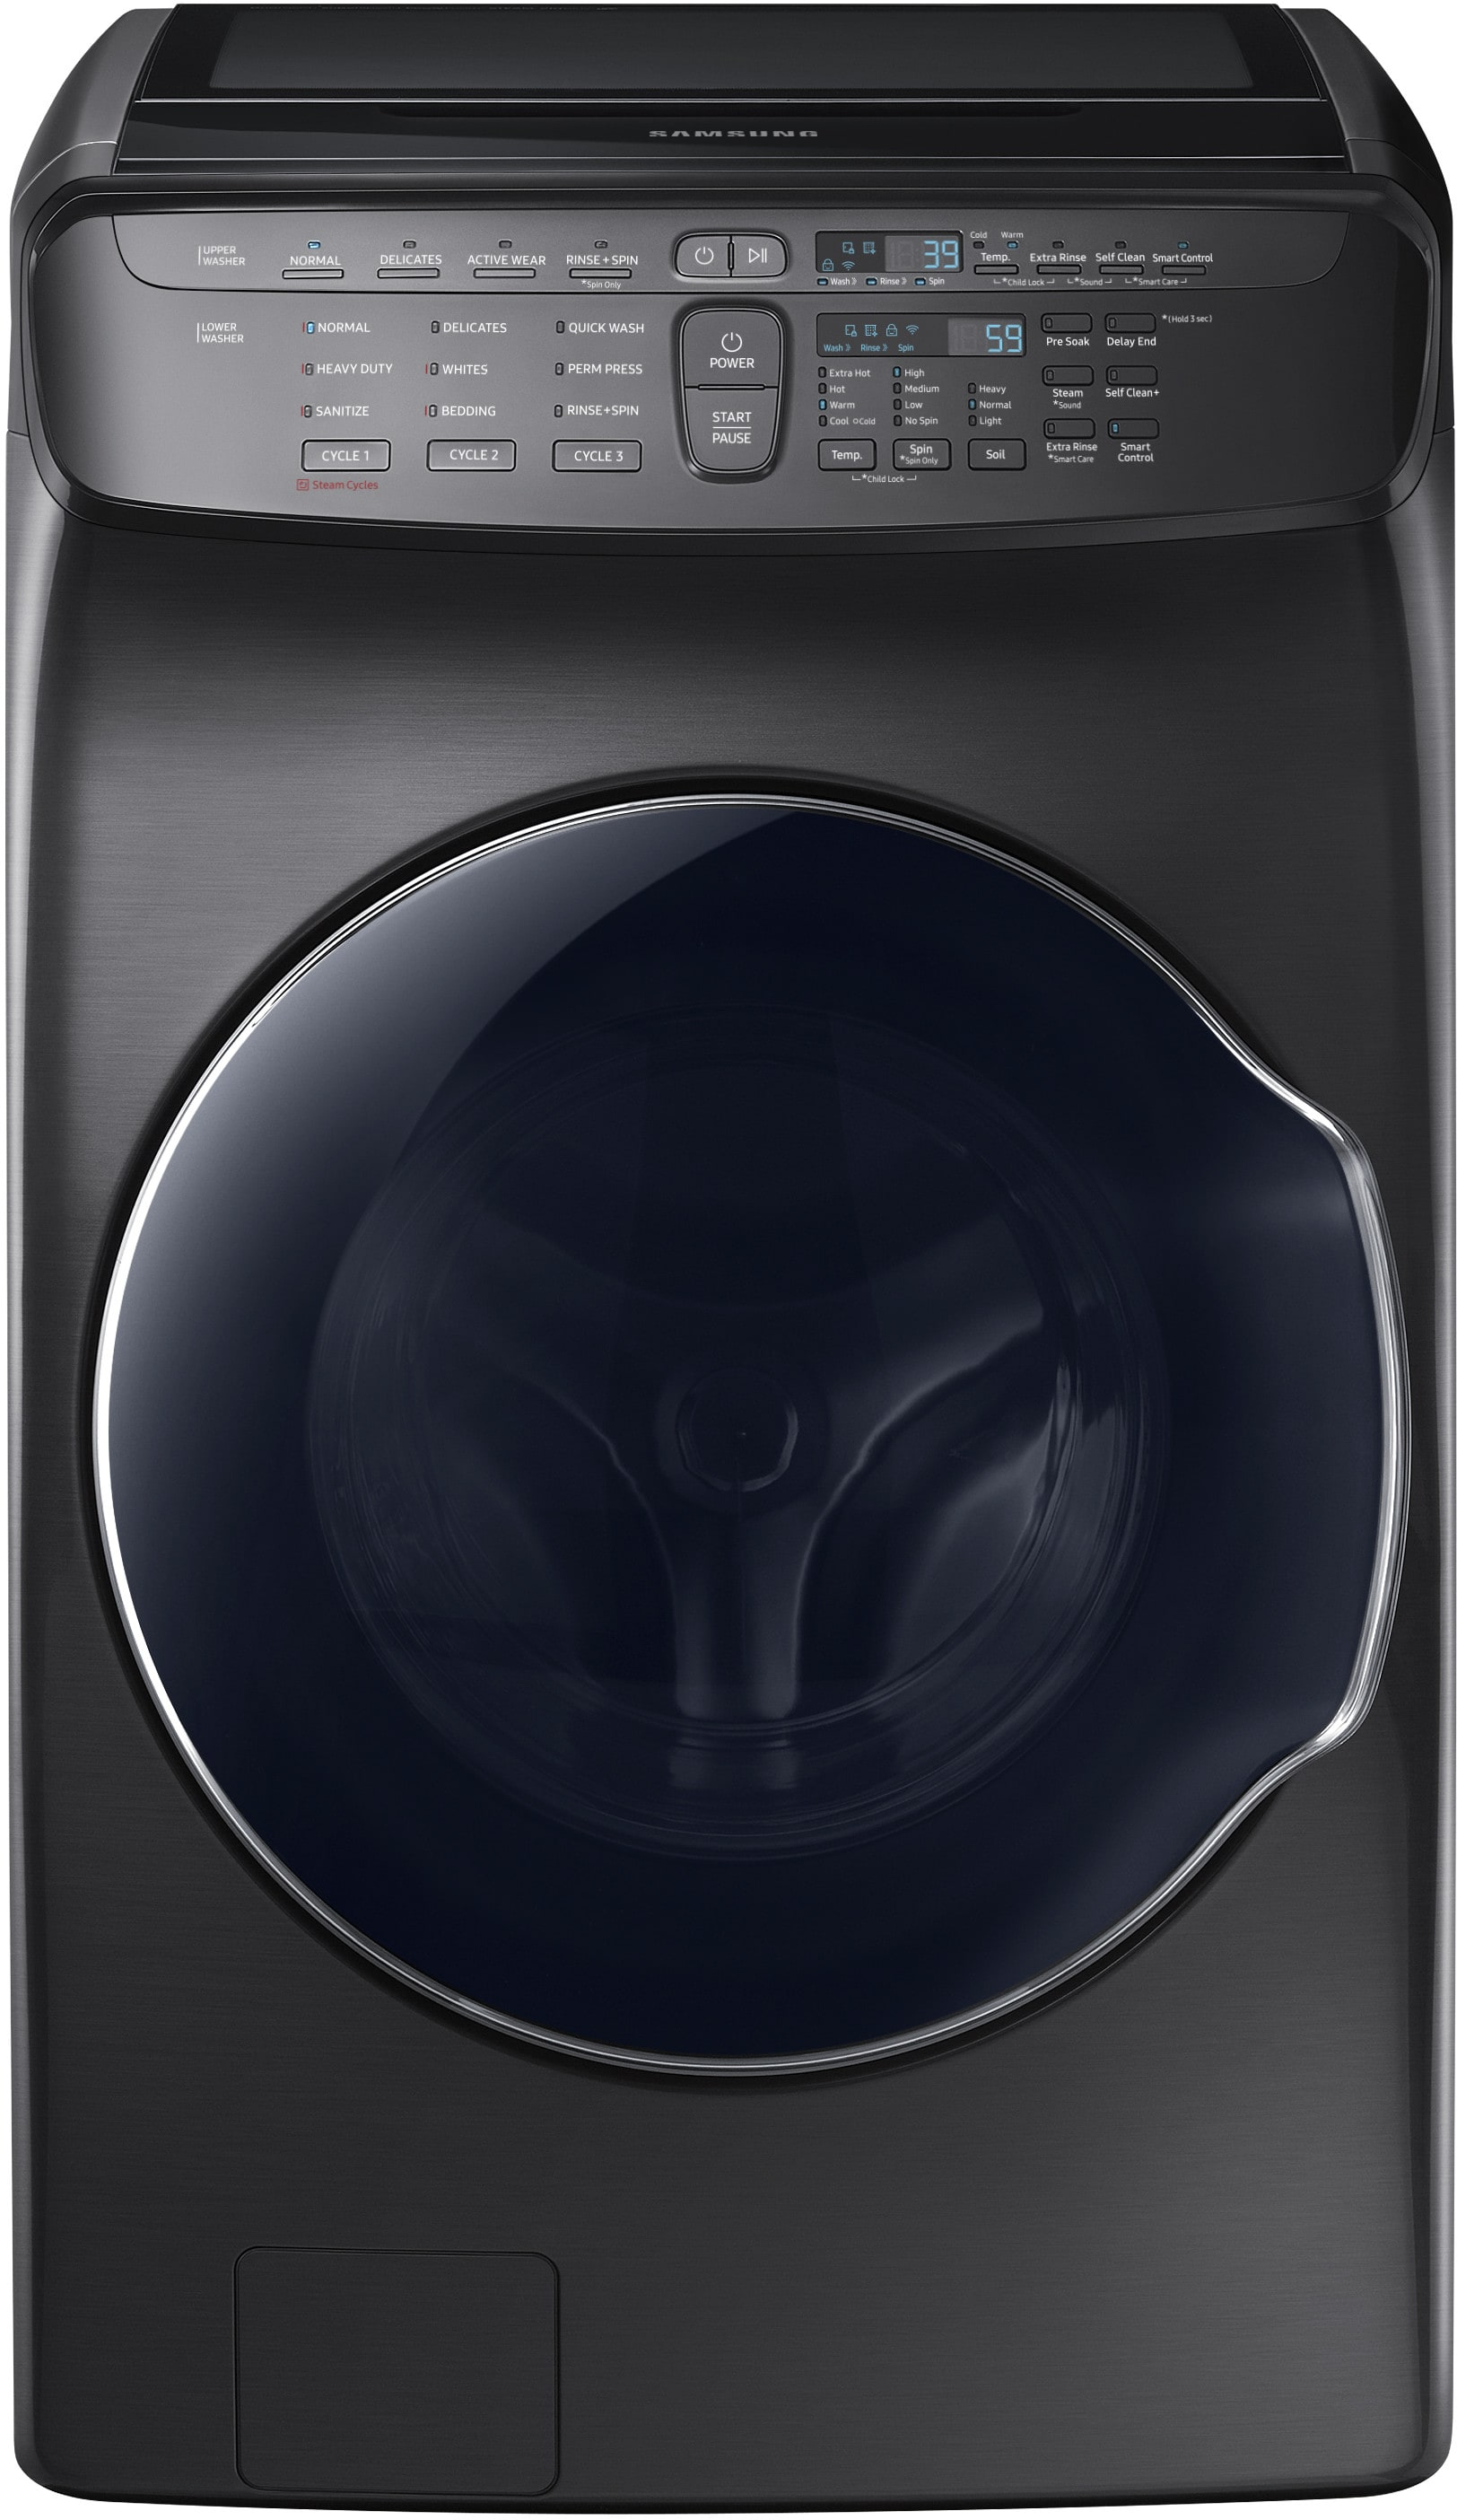 Samsung Dvg55m9600v 27 Inch Flexdry Gas Smart Dryer With